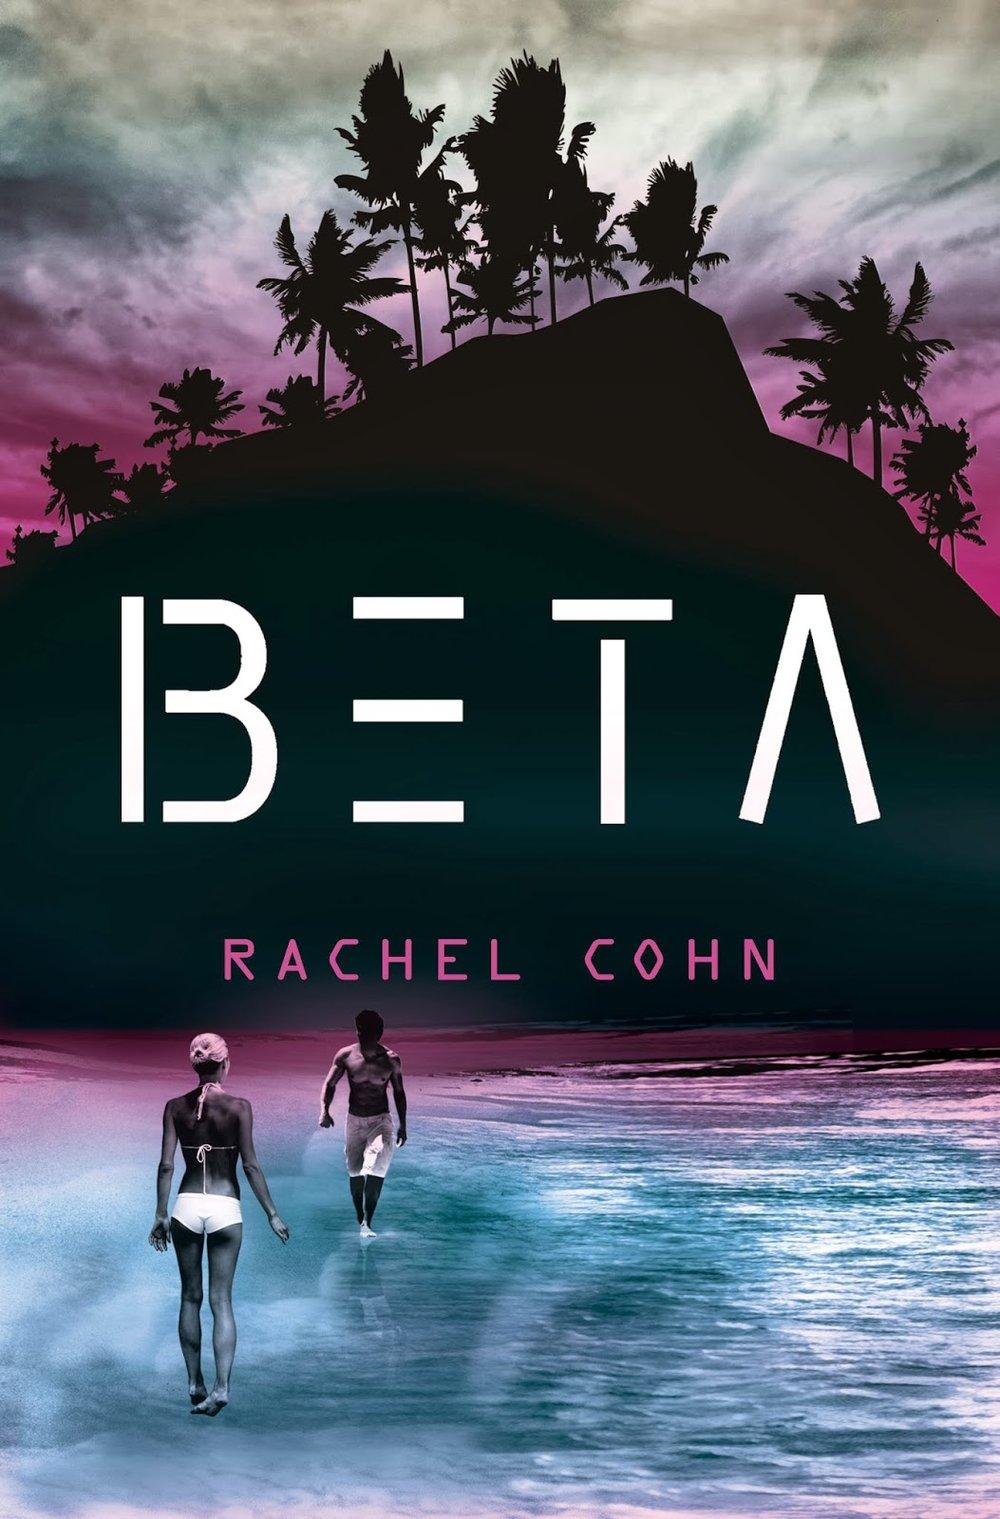 rachel-cohn-beta.jpg